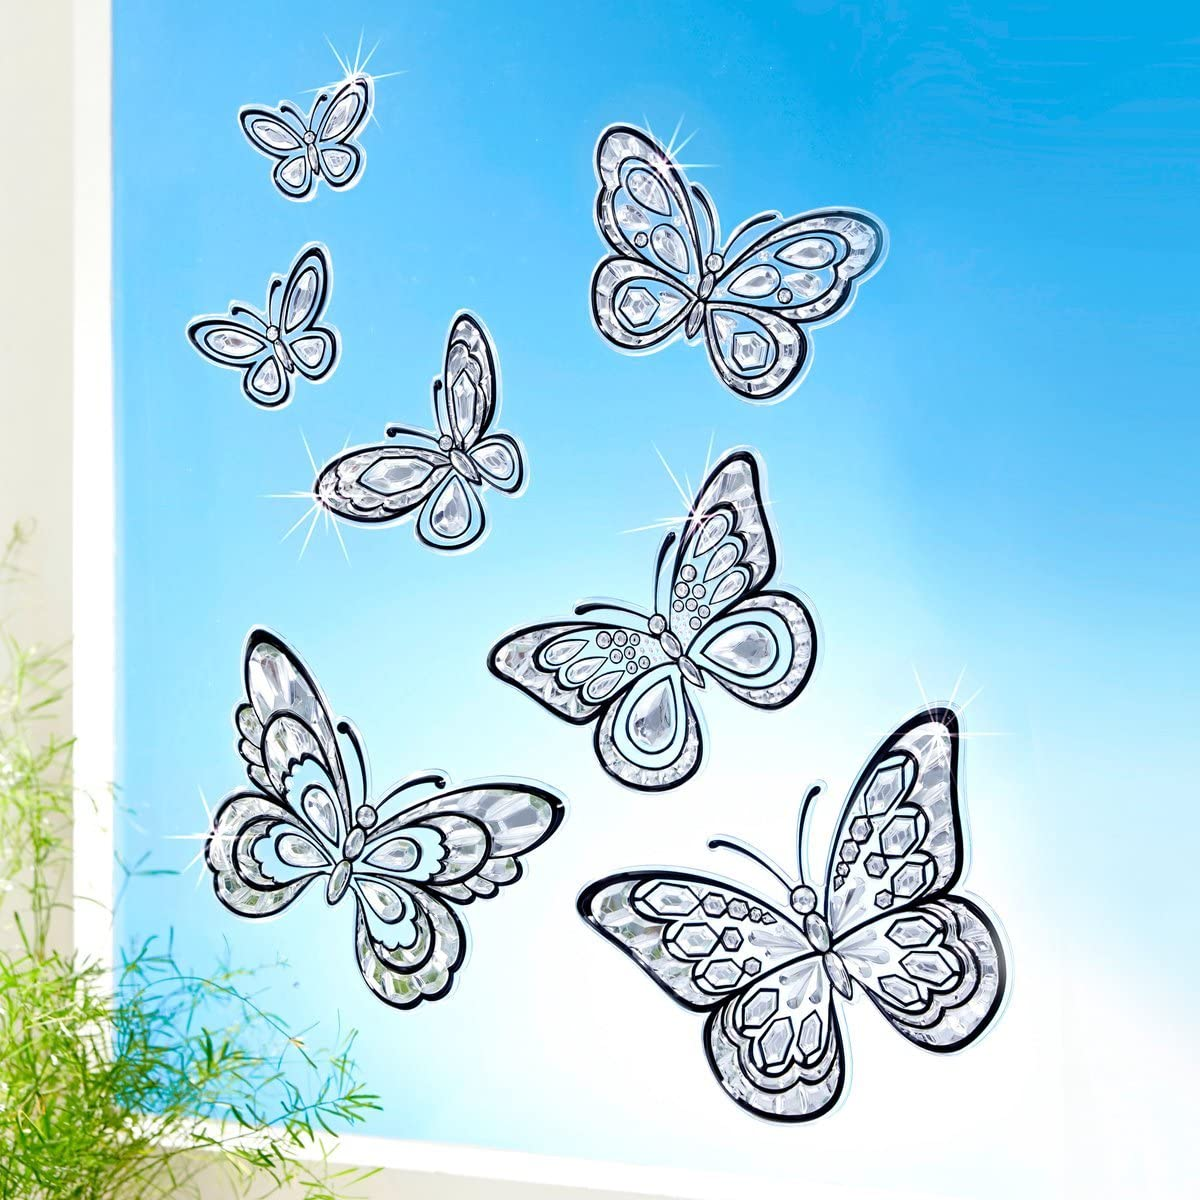 Unbekannt TRI Kristall-Deko Schmetterling 7 St/ück Fensterdeko Fenstersticker 3D-Effekt